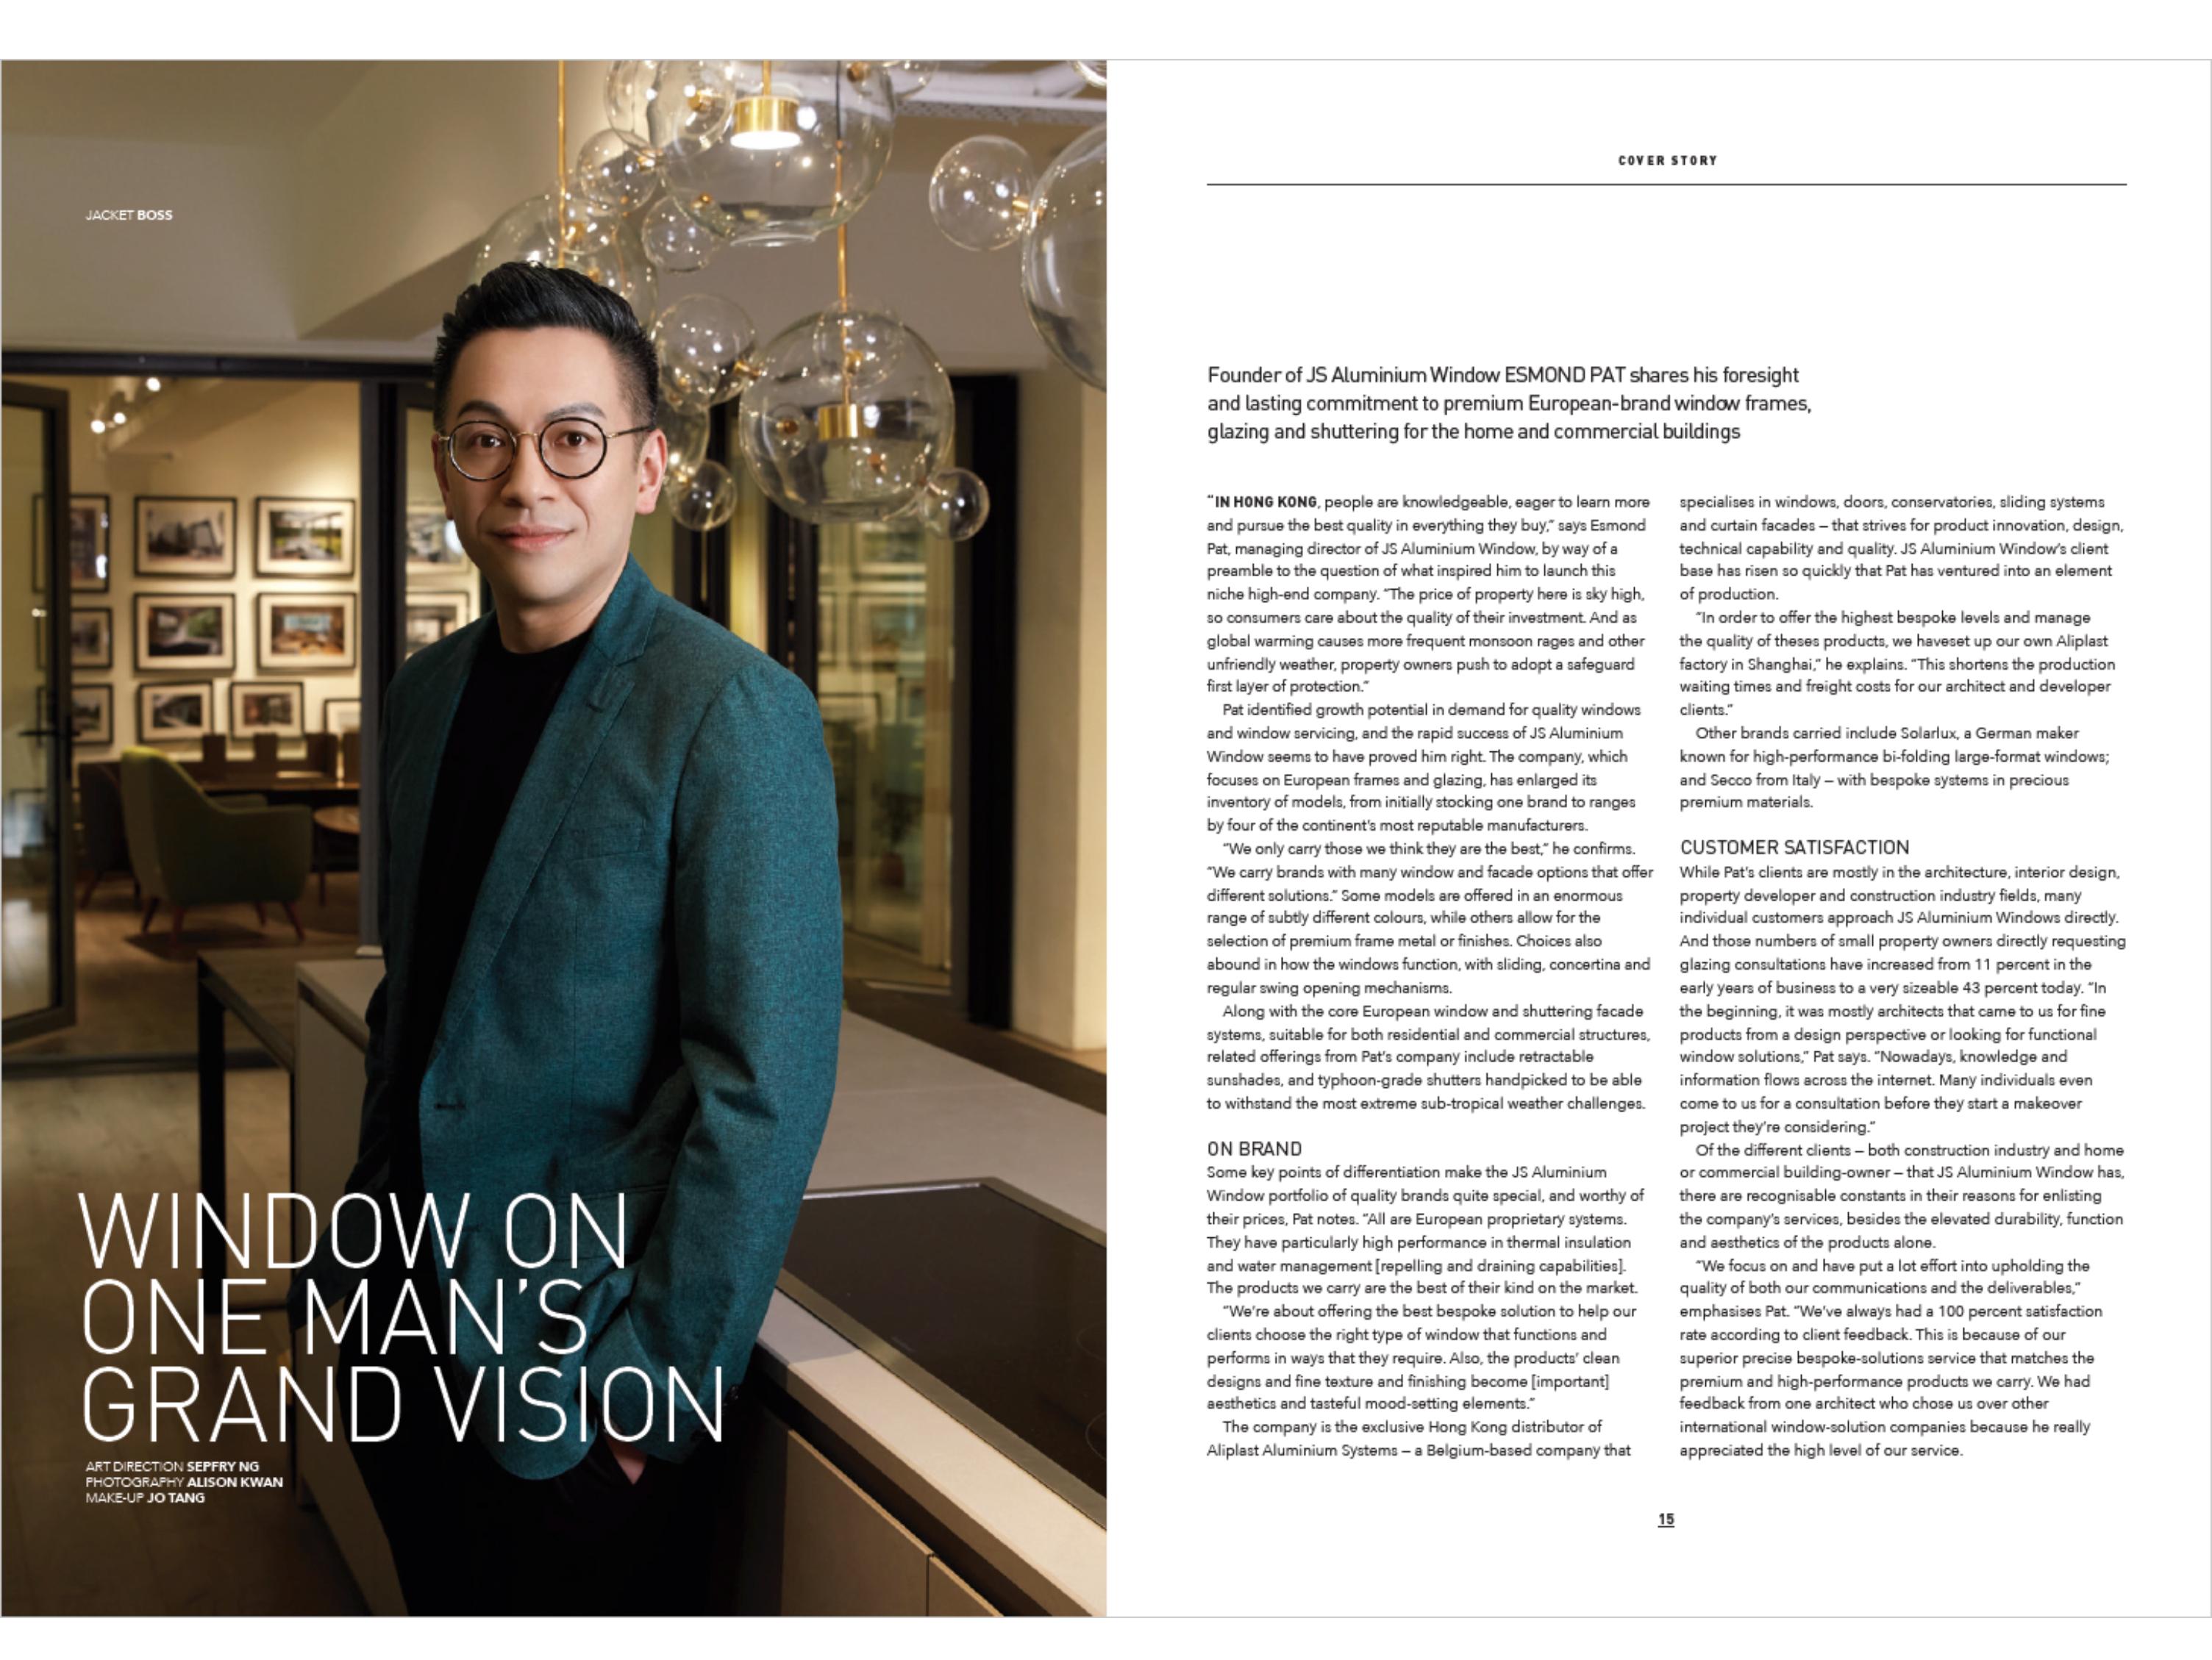 Window Expert & Founder of JS - Aluminium Windows in Hong Kong (香港優質鋁窗公司) 鋁窗專家